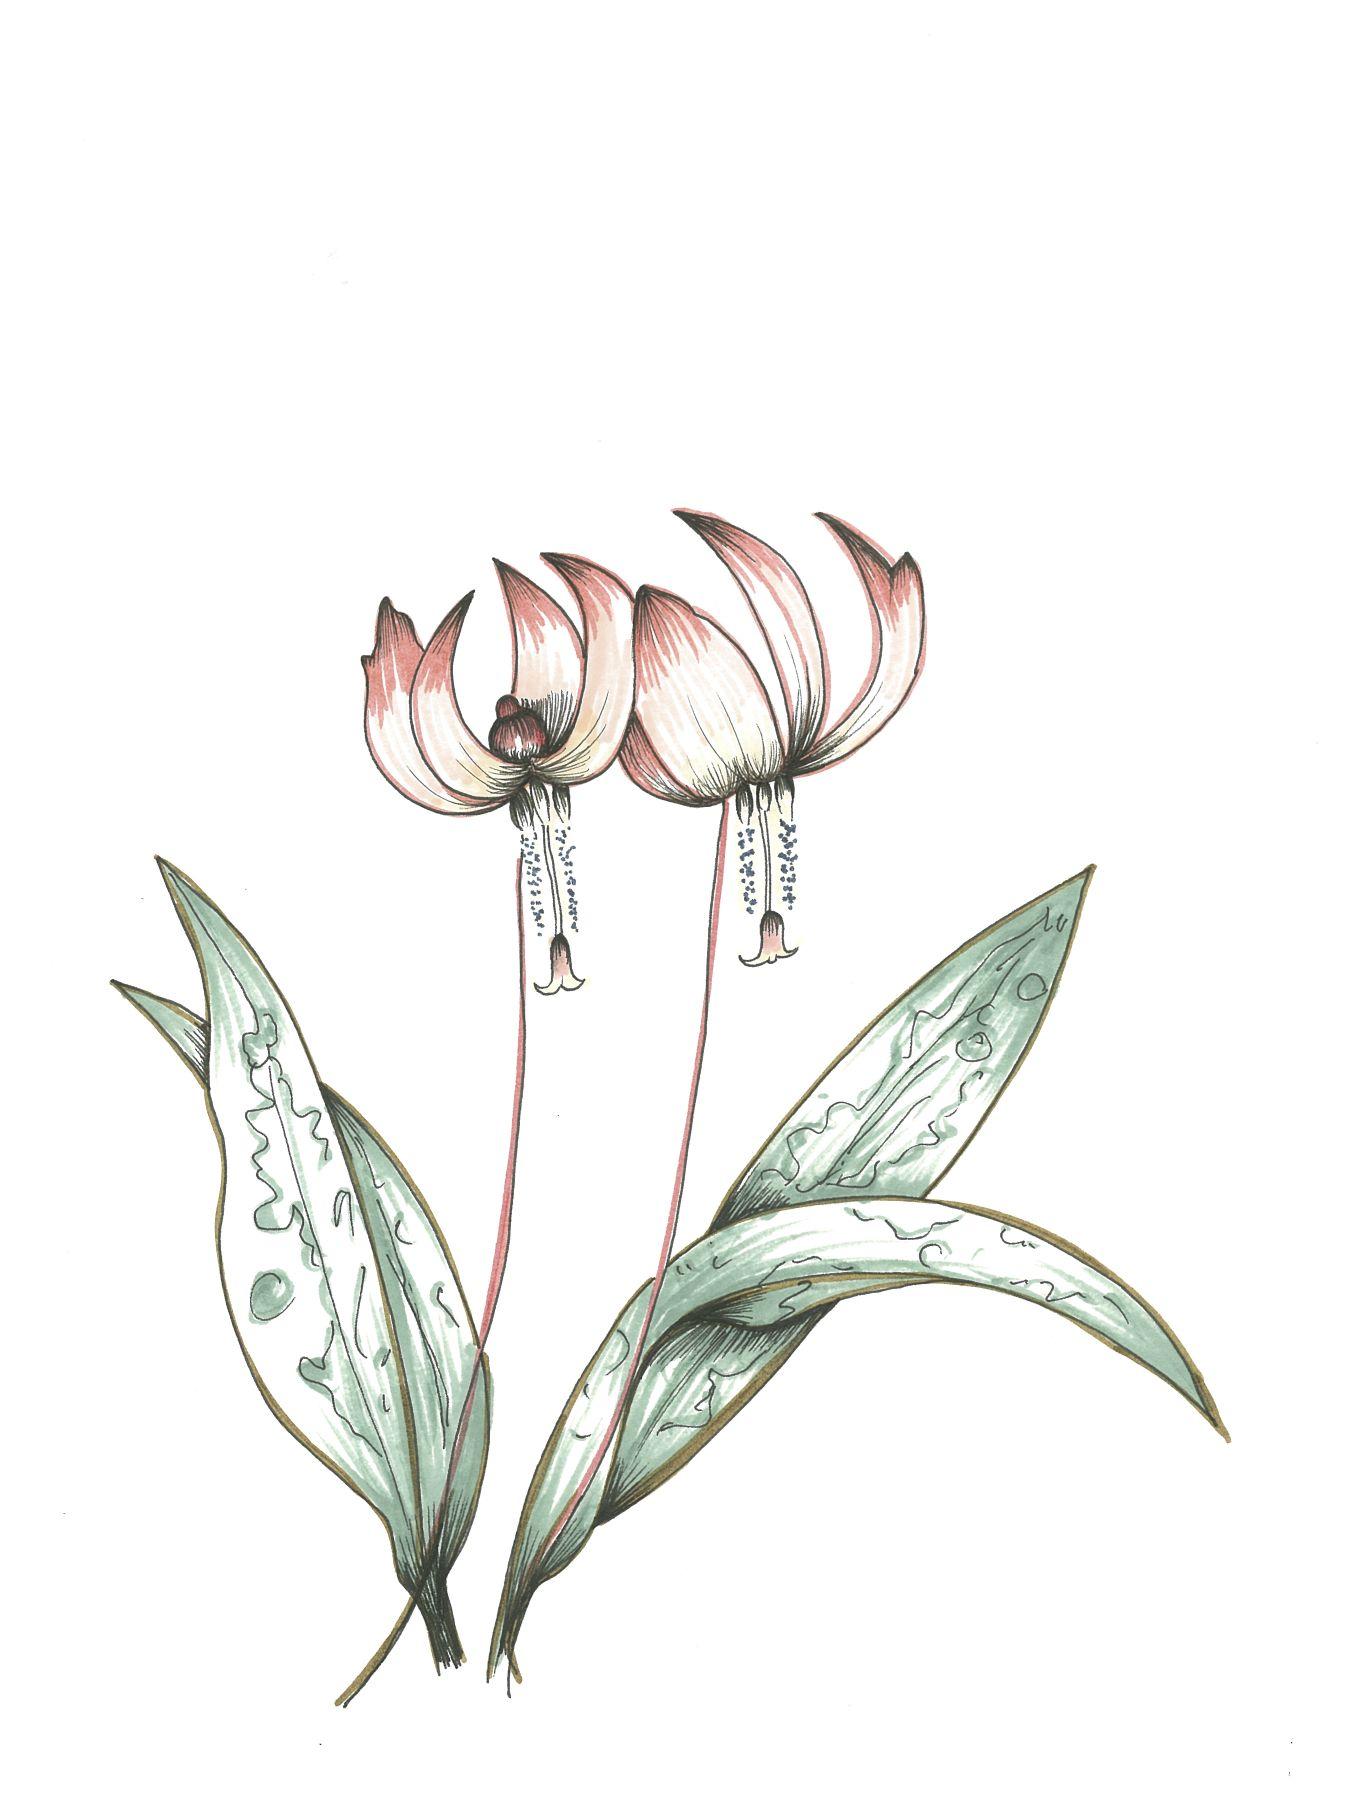 """LITTLE DANCER"" original 9x12 pen and ink illustration by Ming Schipper.  #ElementEdenArtSearch"